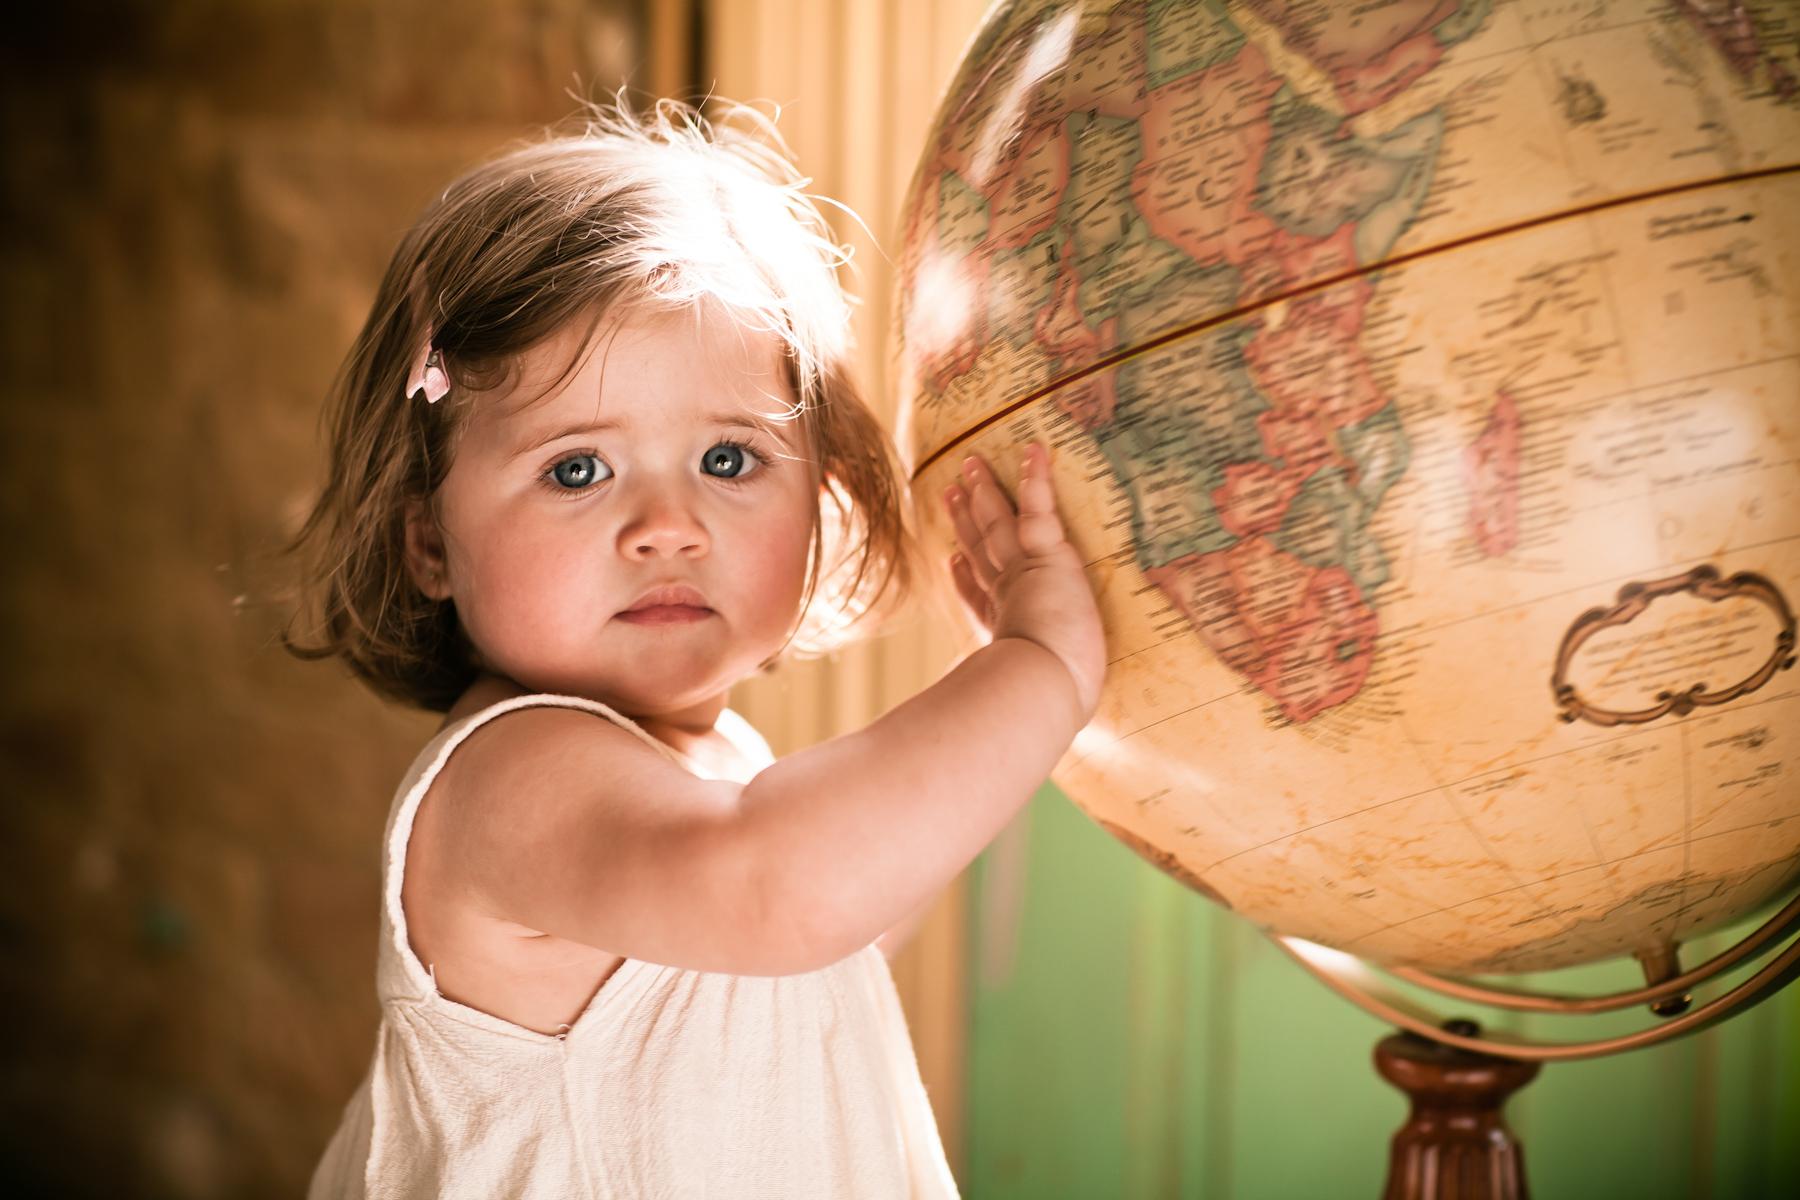 Girl with hand on globe